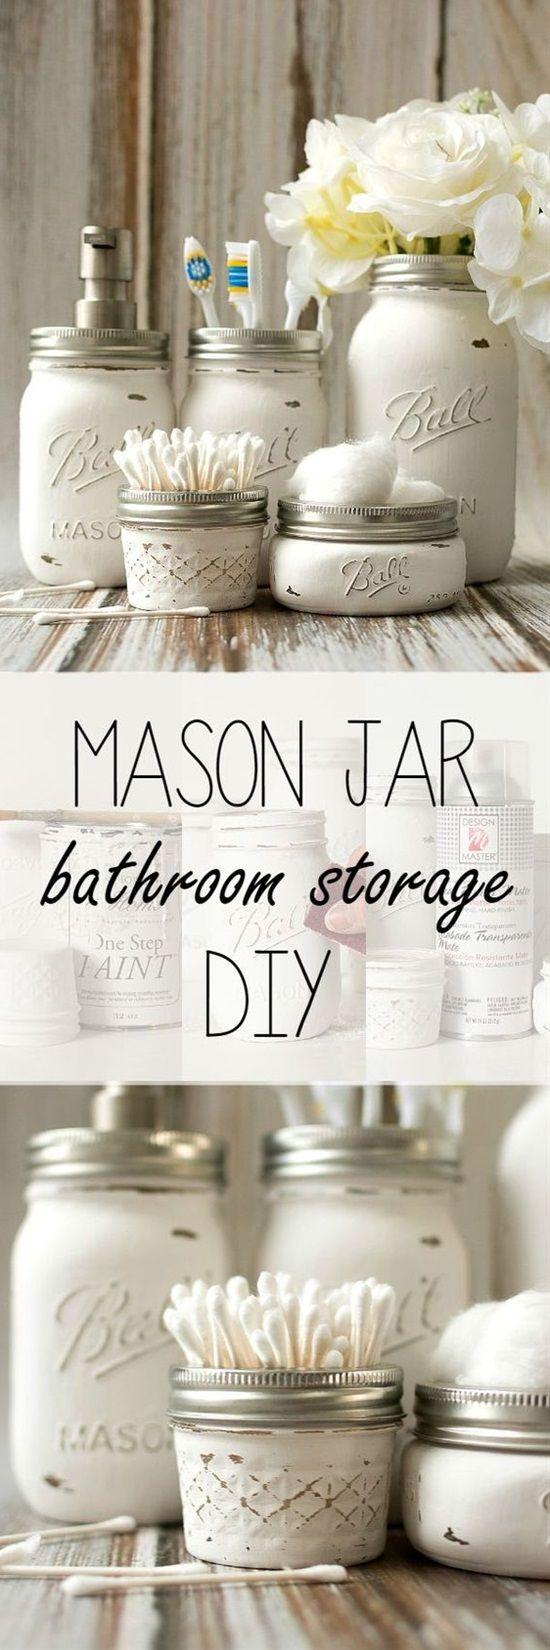 best mason jar crafts images on pinterest mason jars glass